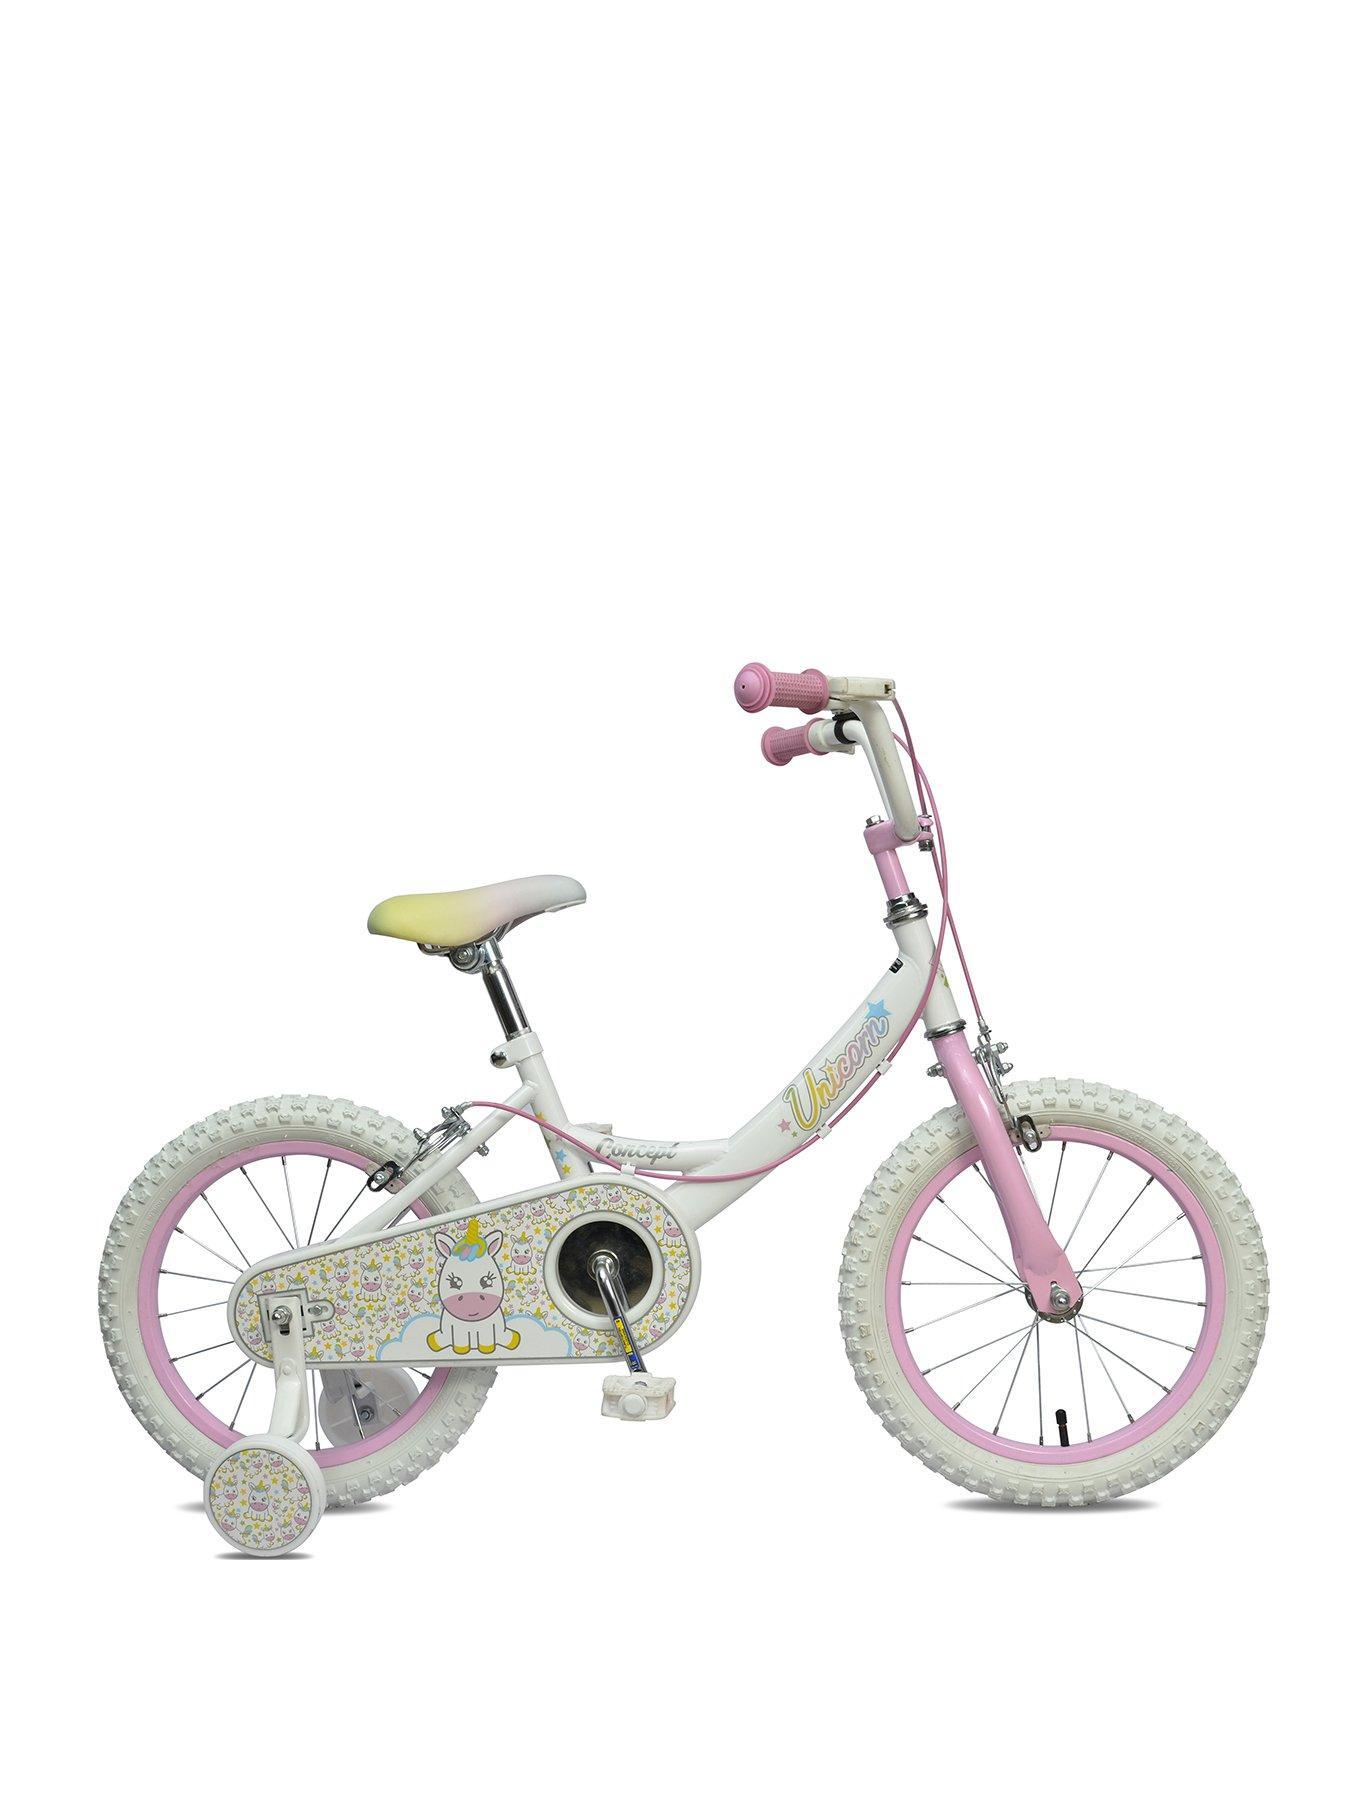 5 6 years toys littlewoodsireland ie BMW X5 Drive Car Toddler Toy concept unicorn girls bike 16 inch wheel